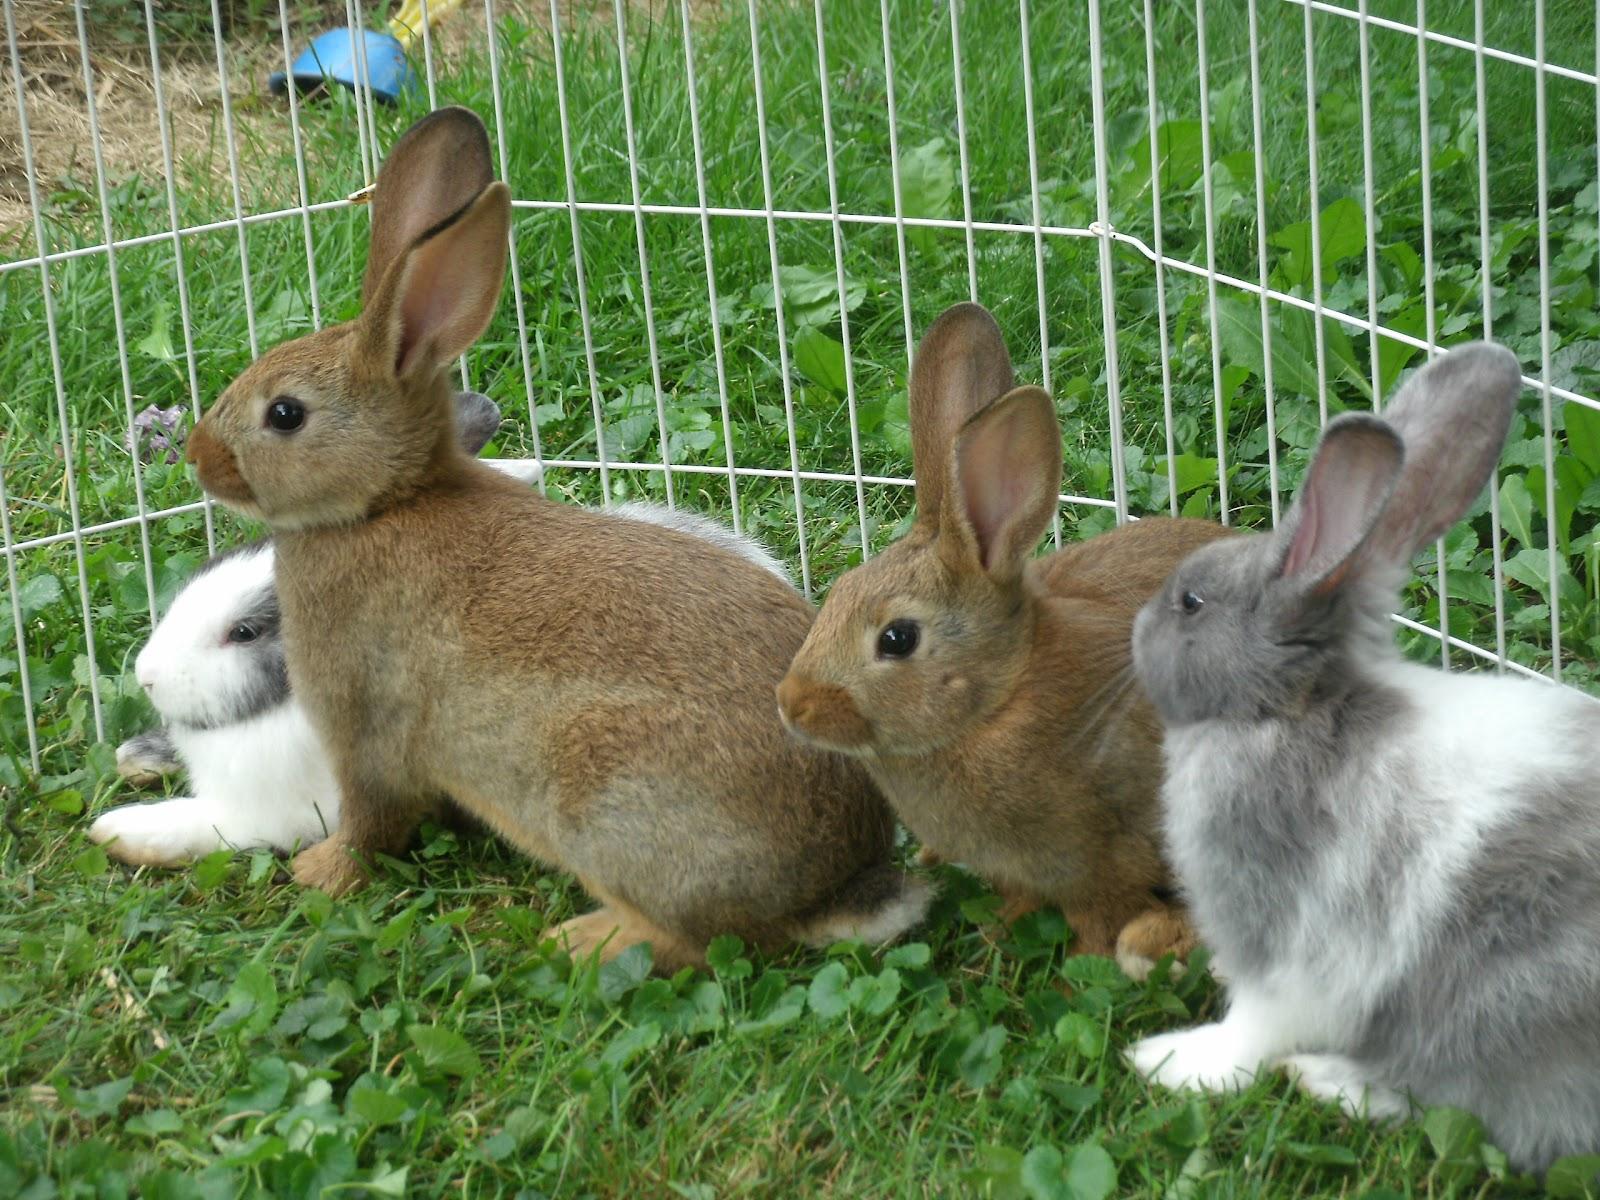 Rabbit chat now